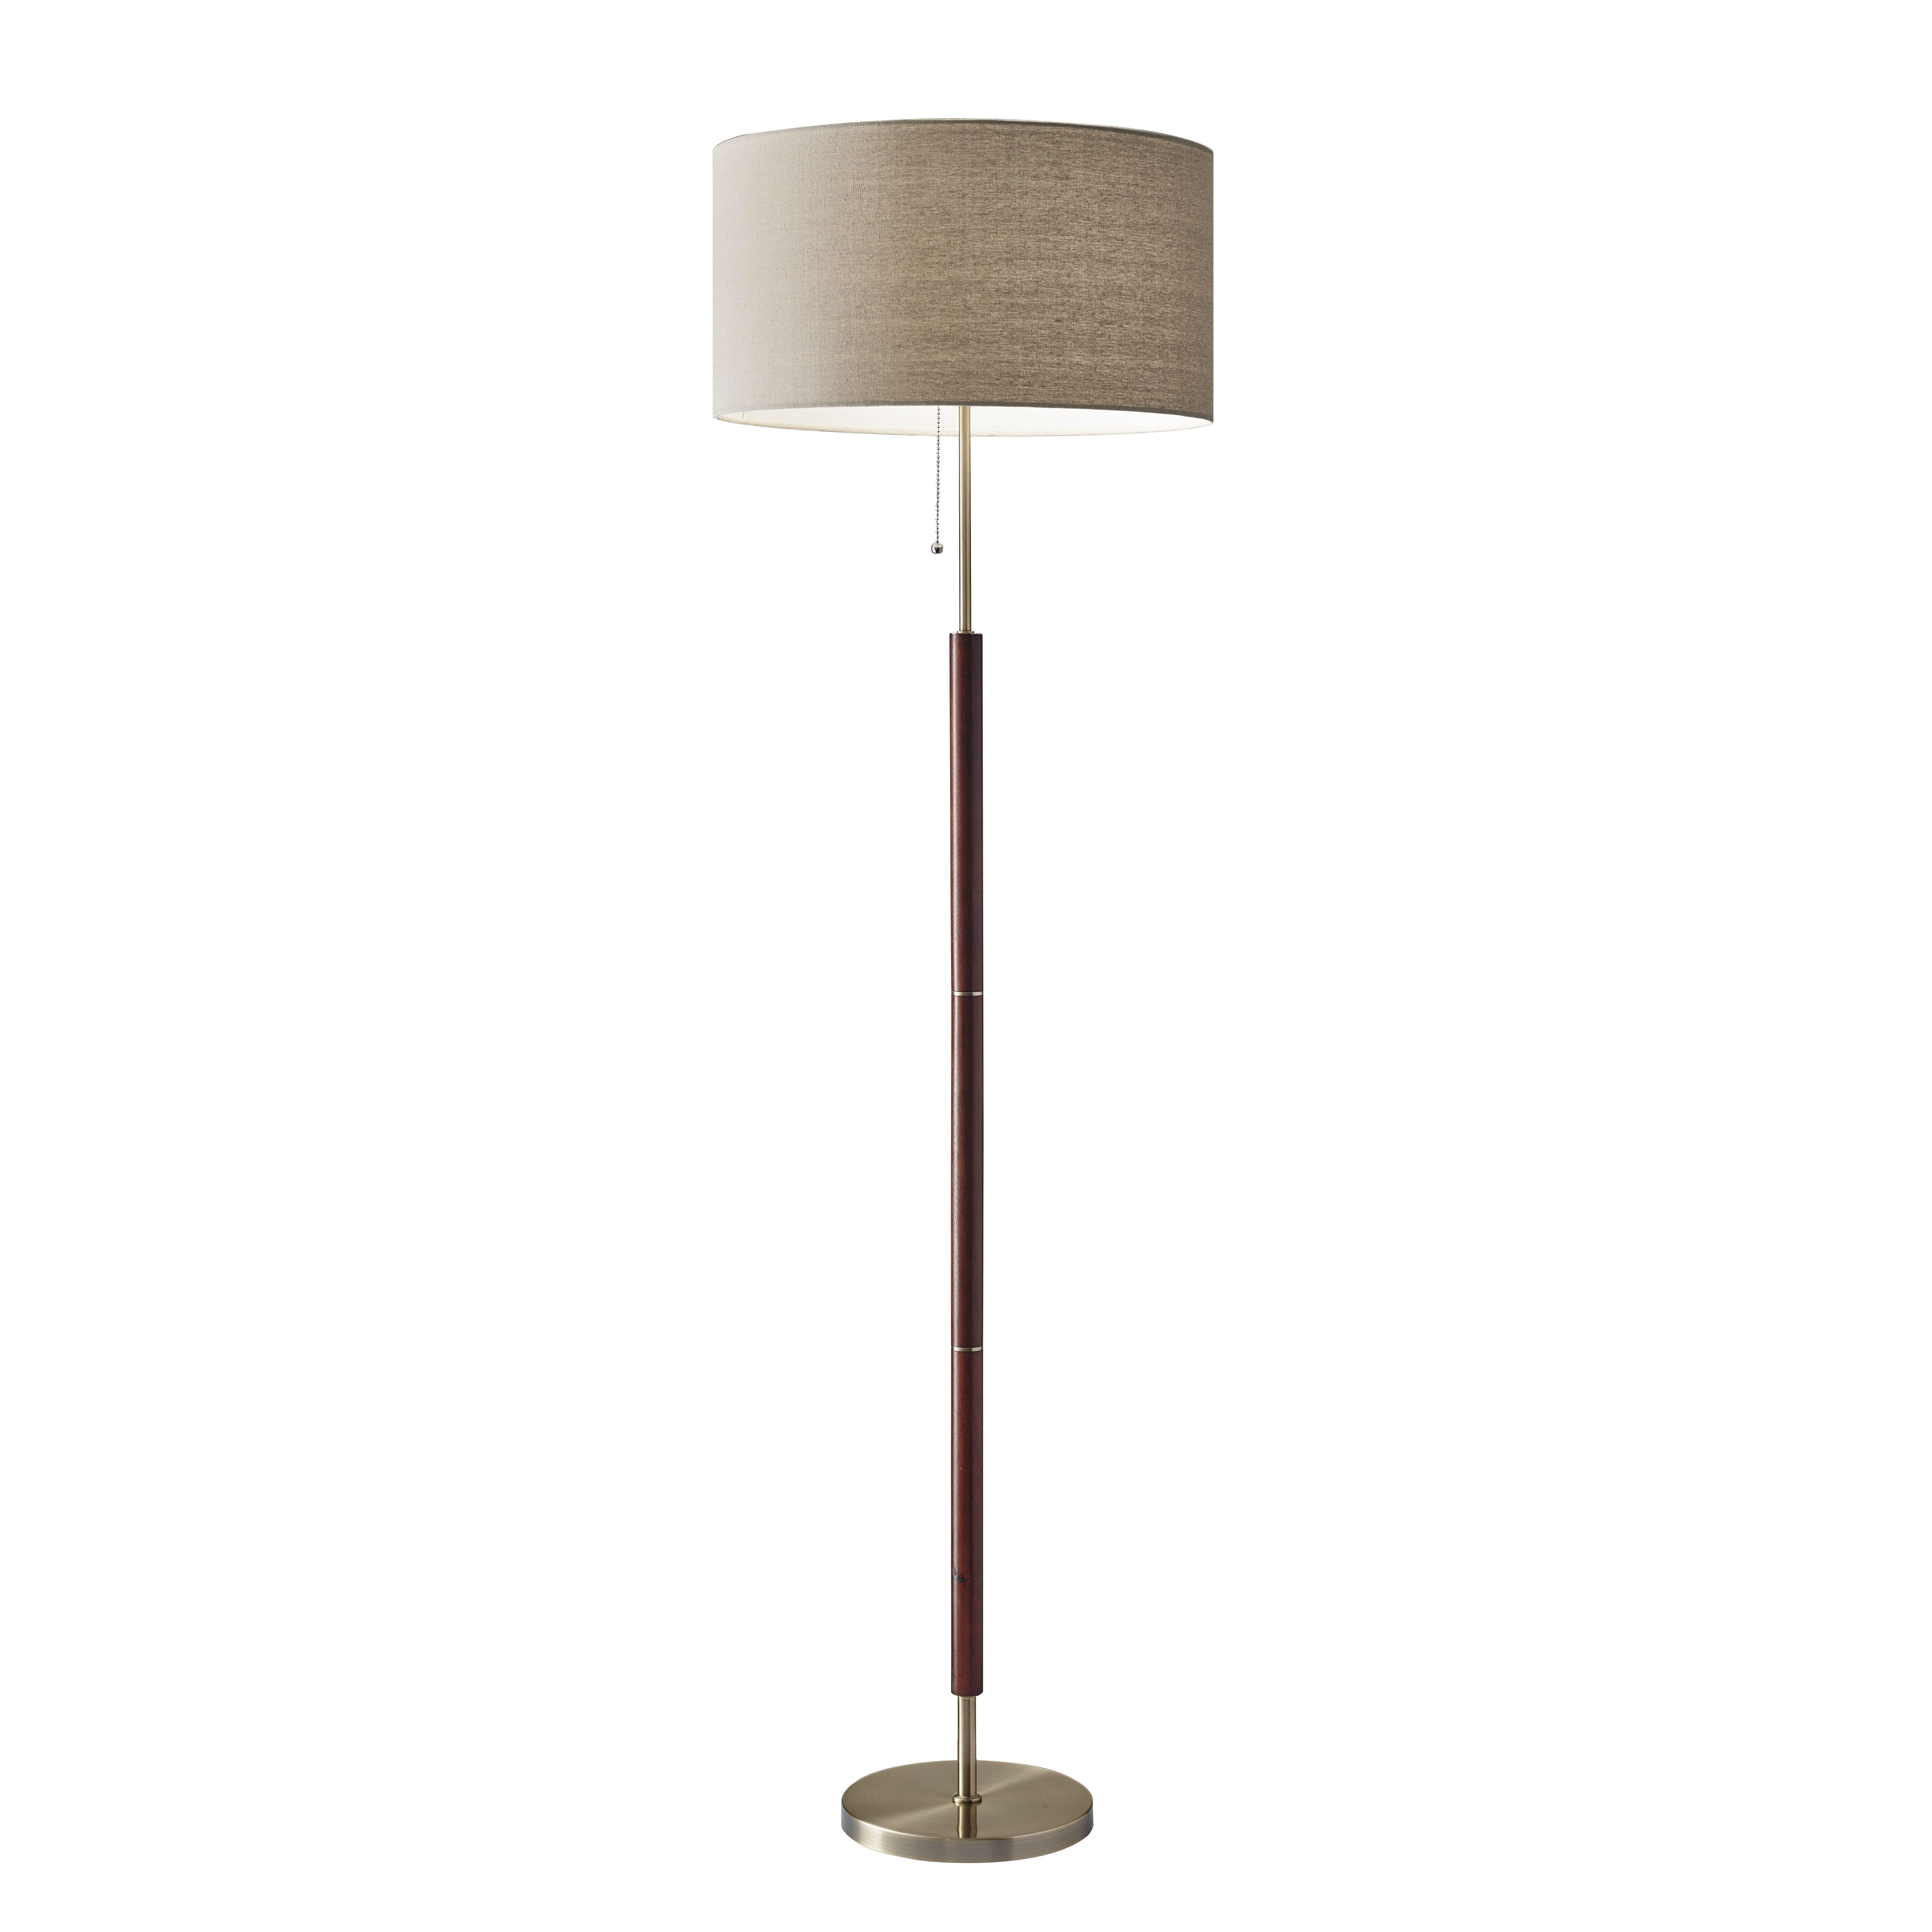 adesso hamilton 65 5 floor lamp reviews wayfair. Black Bedroom Furniture Sets. Home Design Ideas